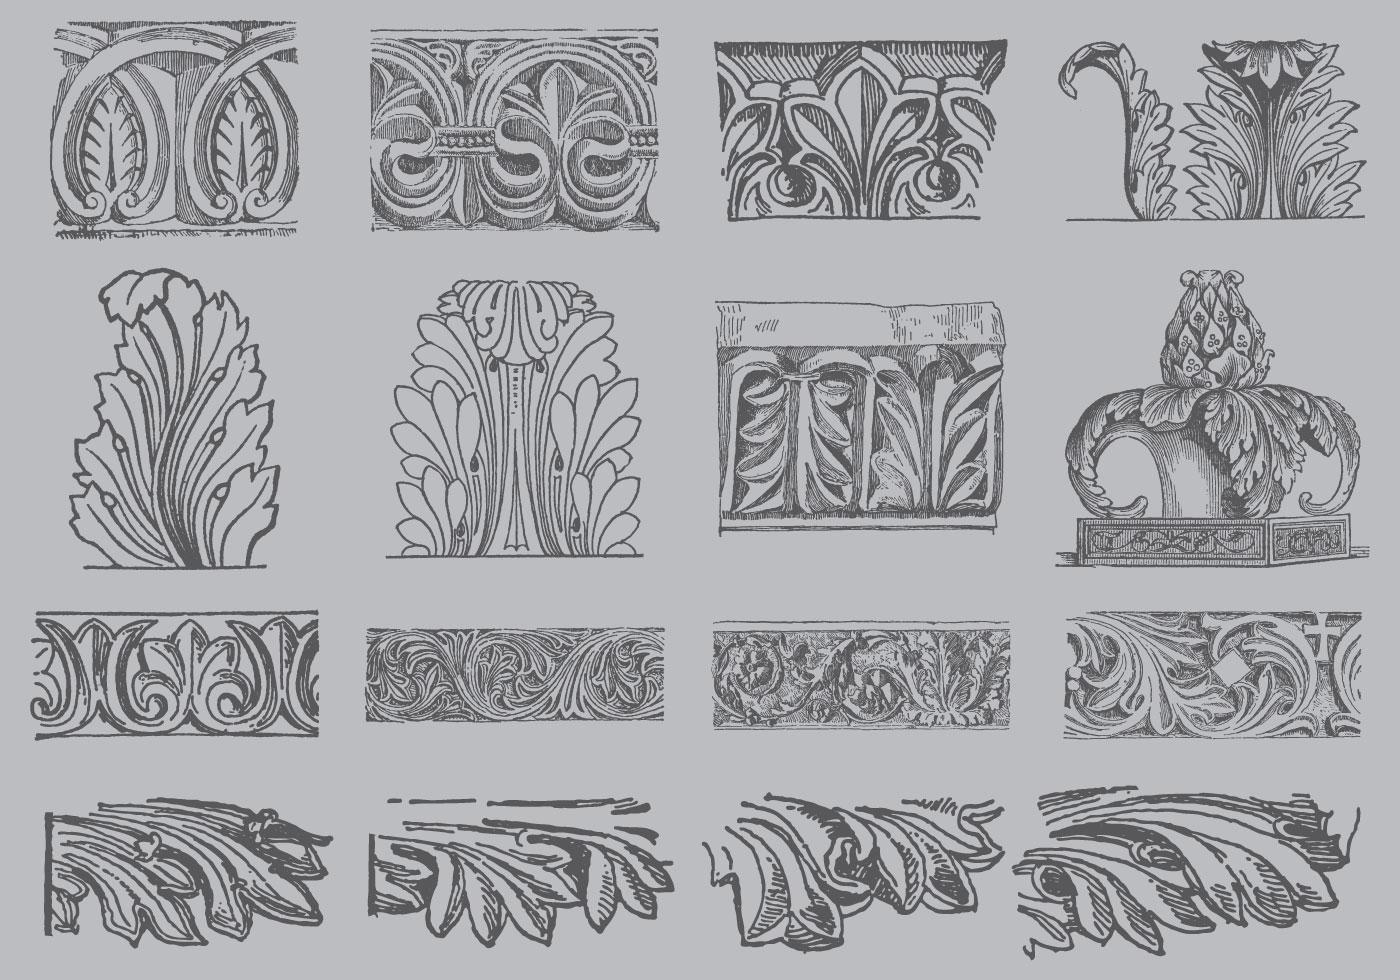 Acanthus ornament vectors download free vector art for Acanthus decoration